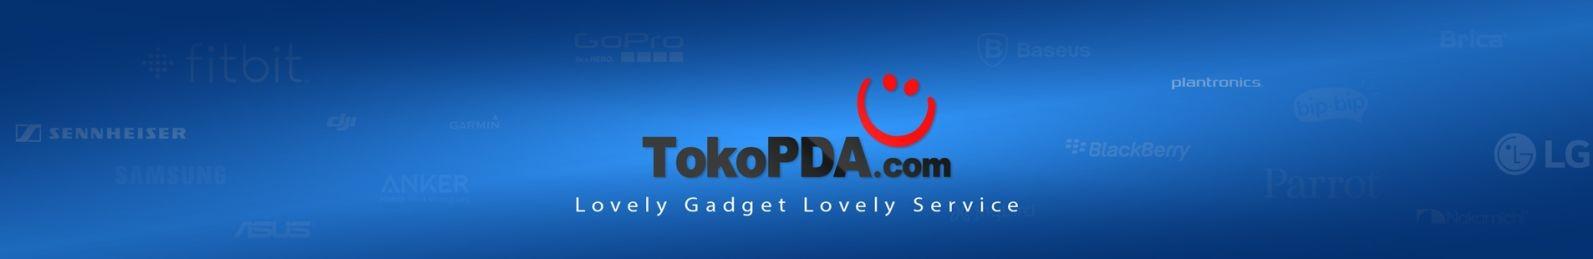 TokoPDA Official Store